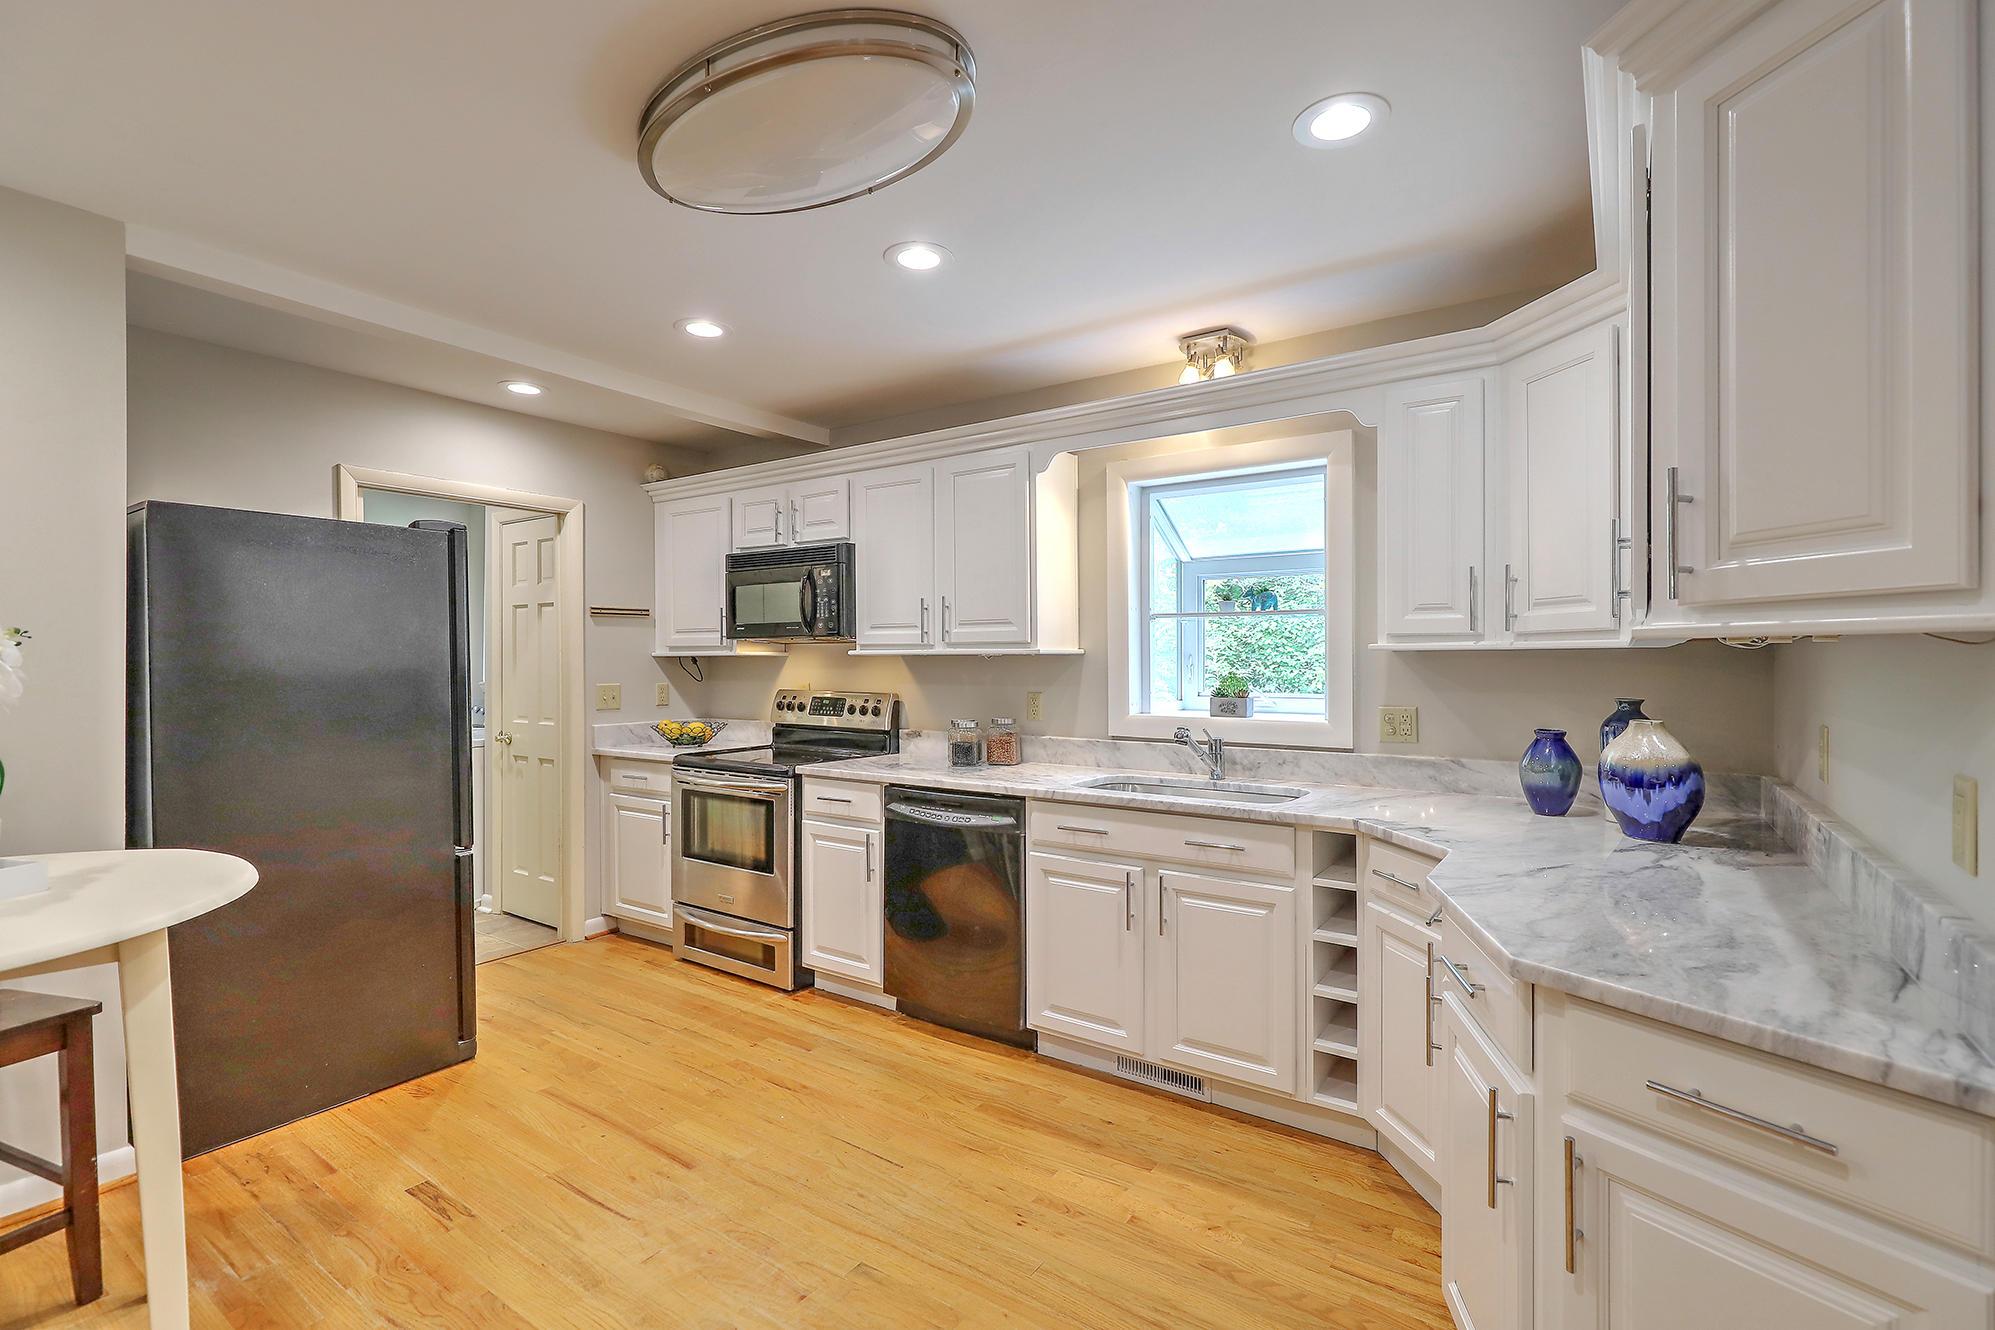 Charlestowne Estates III Homes For Sale - 1313 Coleridge, Charleston, SC - 1